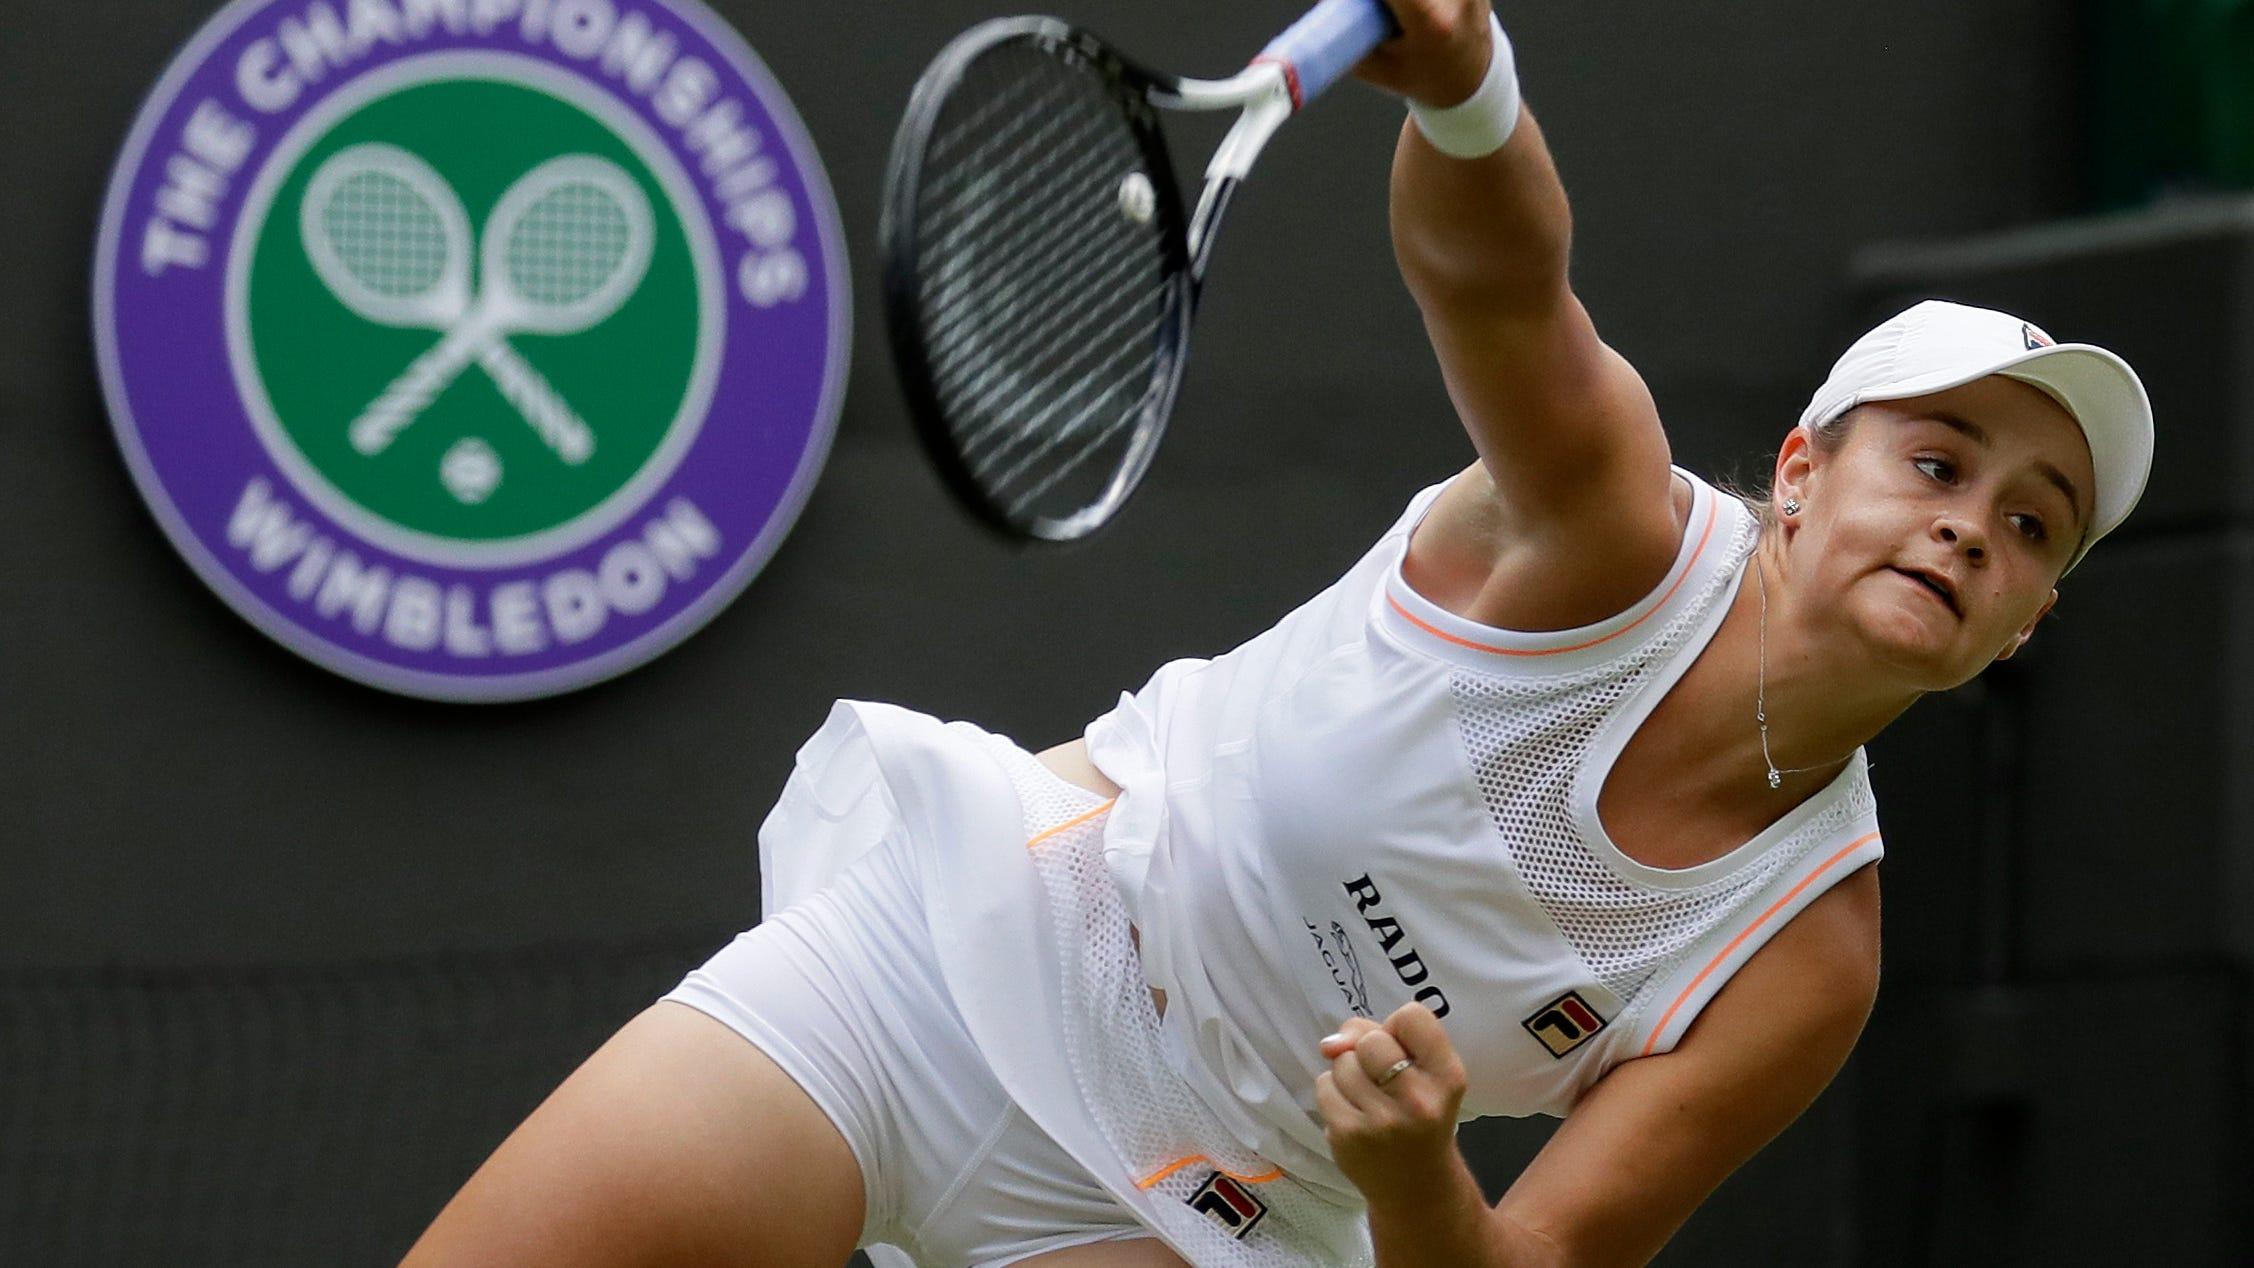 Australian Open 2019: Alex de Minaur stands little chance against Rafael Nadal